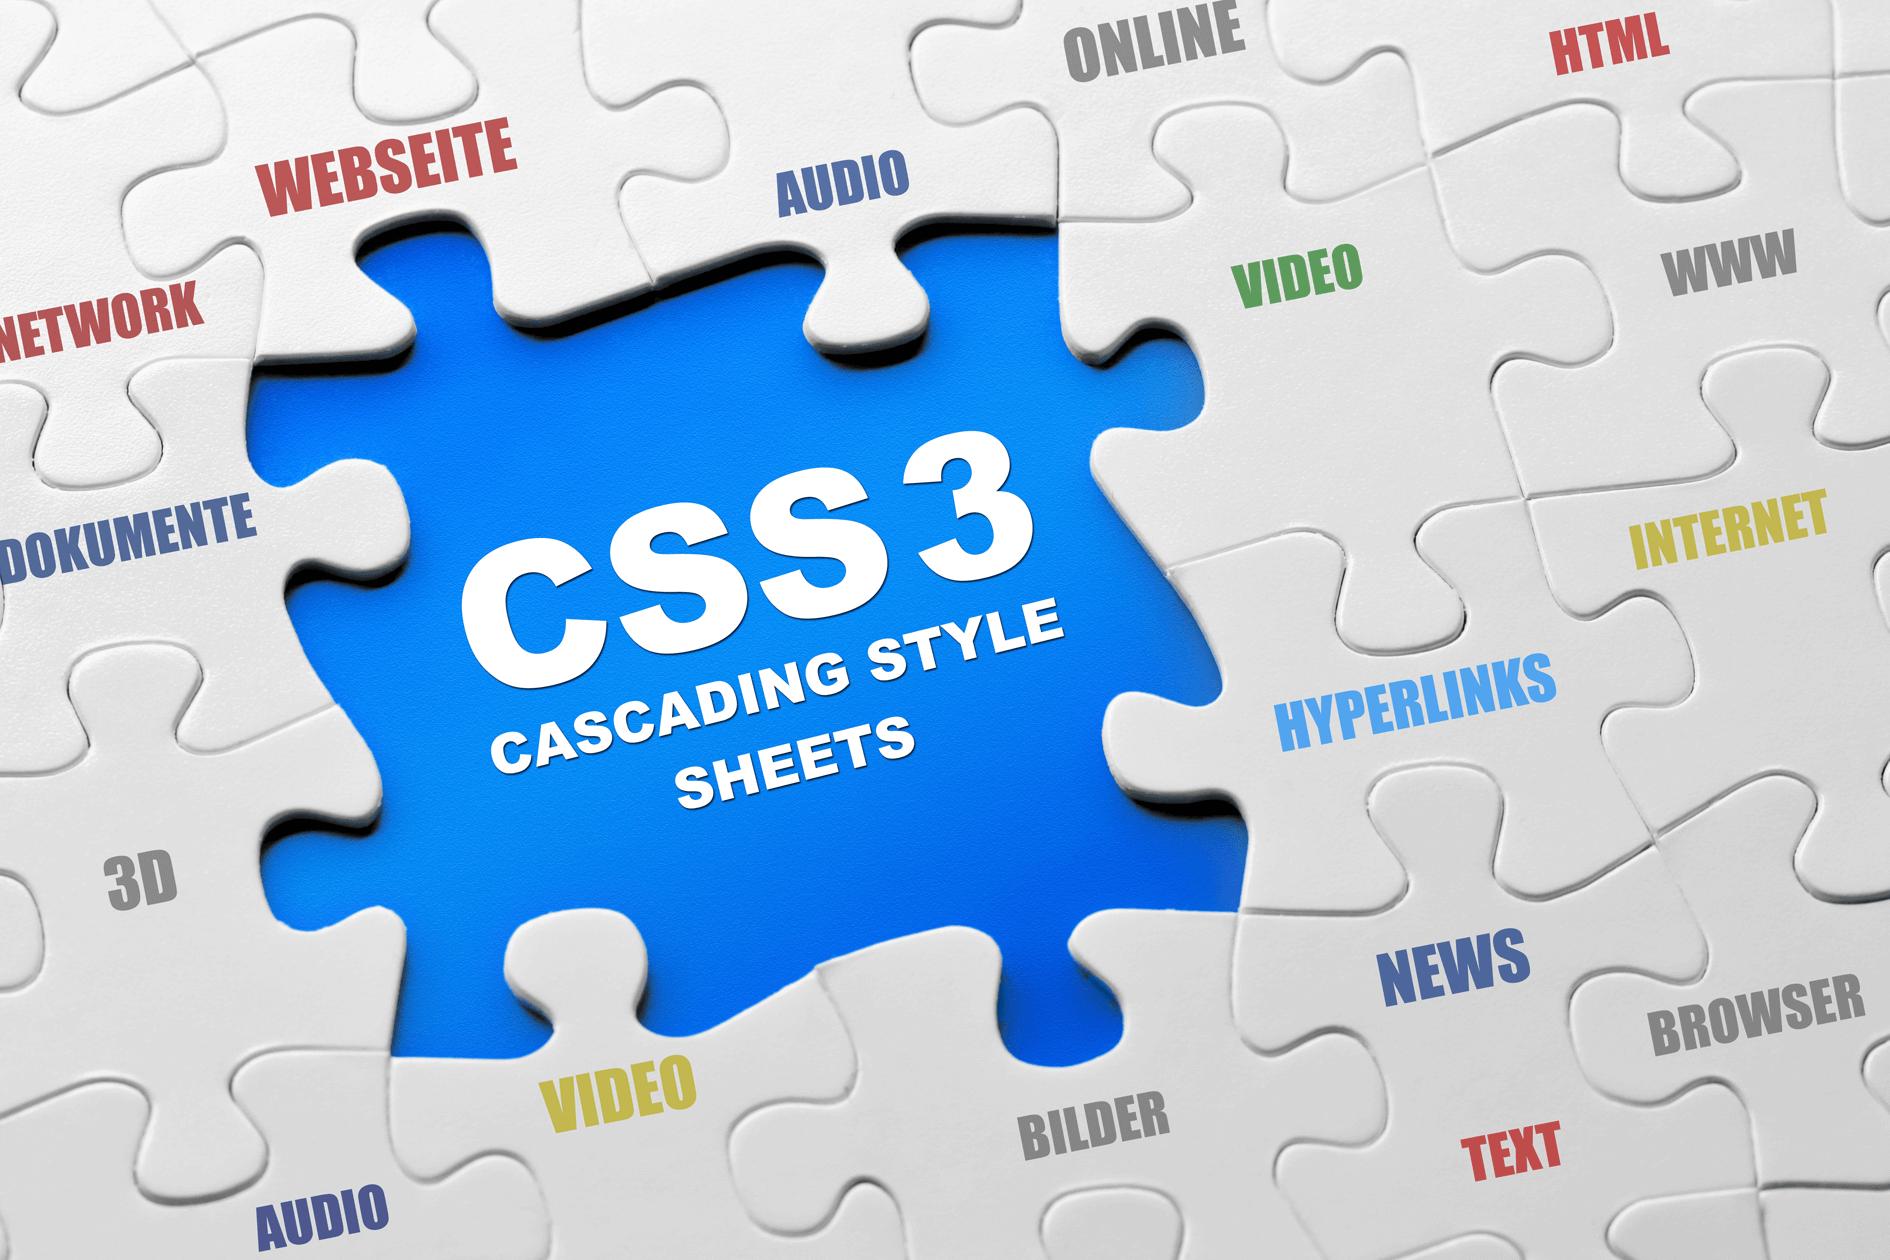 CSSセレクタまとめ、種類別に徹底解説(CSS3対応)